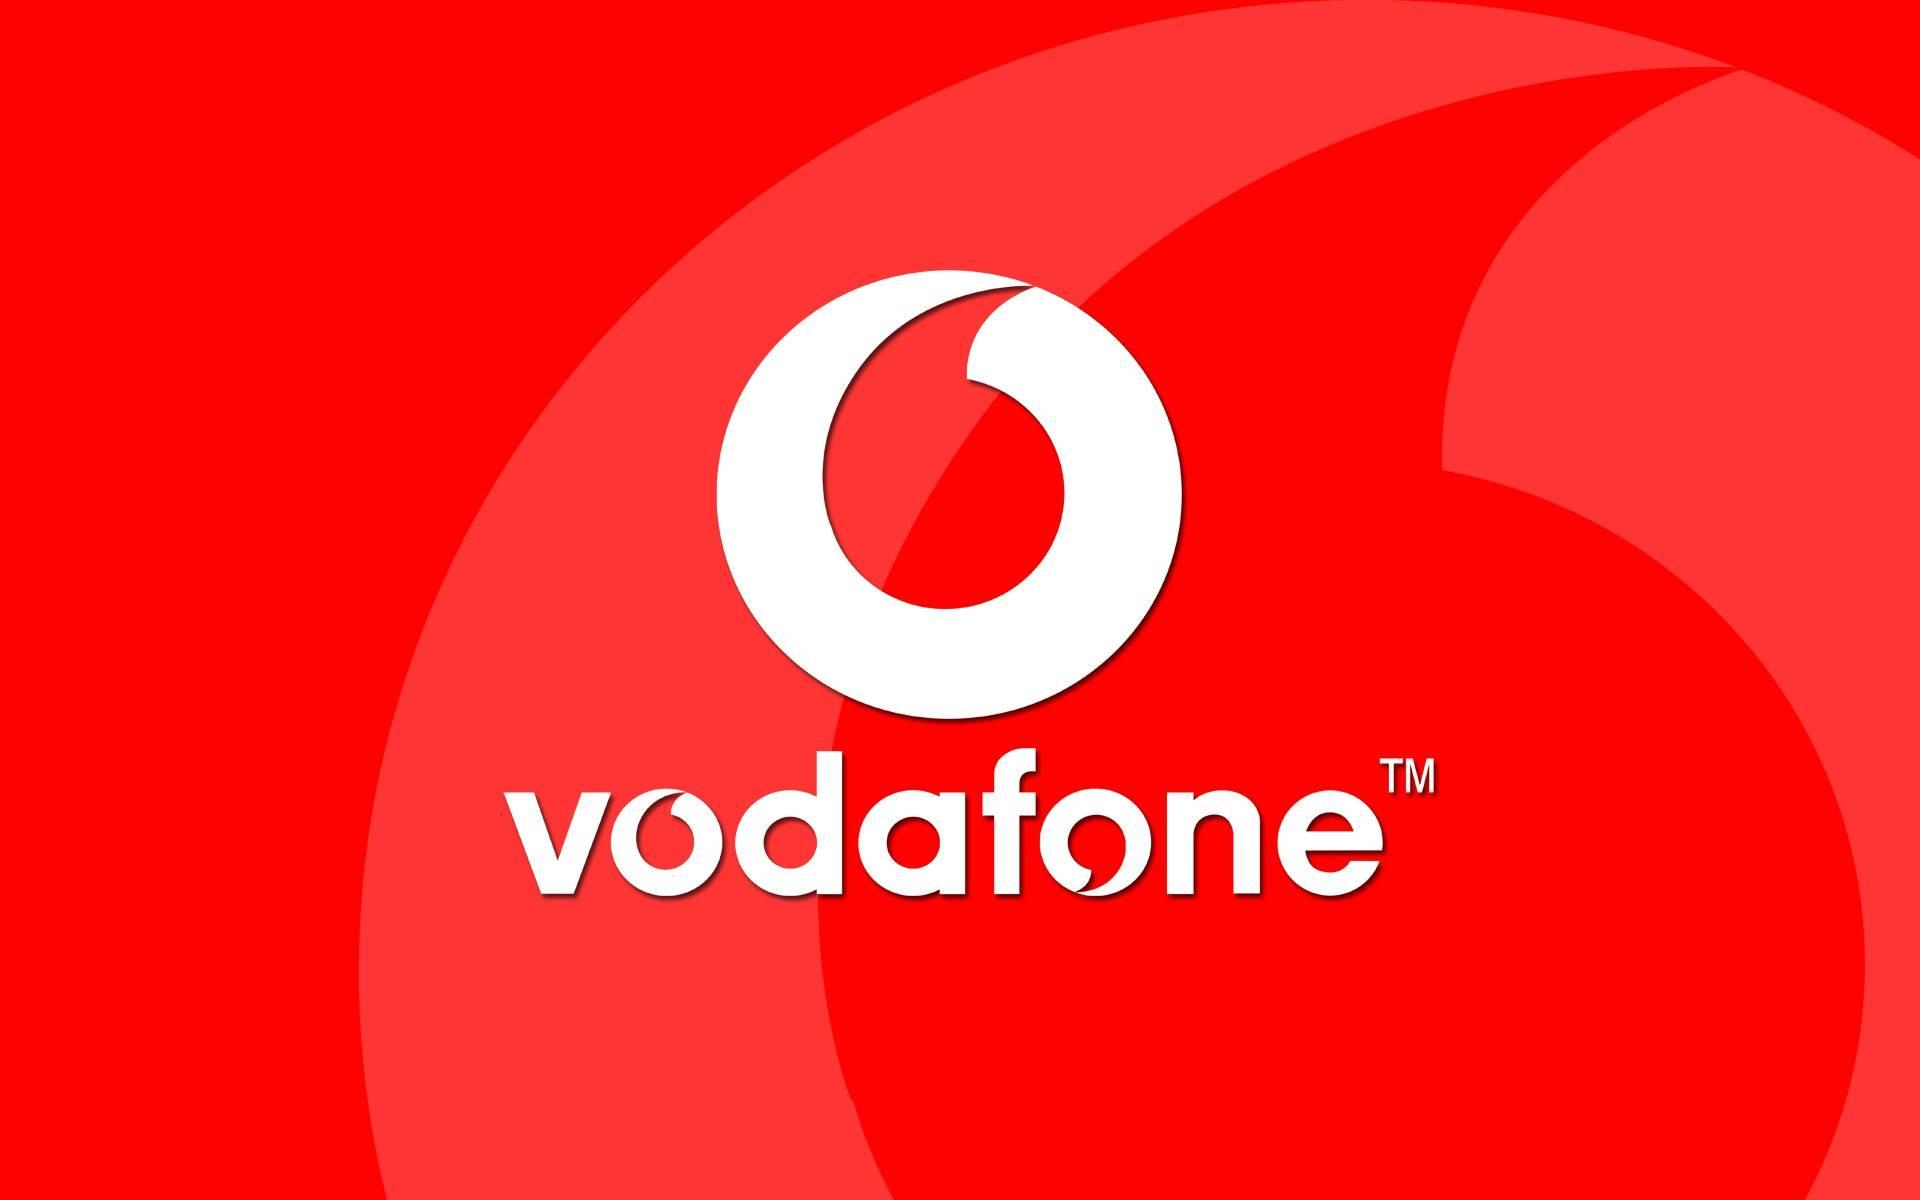 Vodafone Noile Oferte GROZAVE la Telefoane de care sa Profiti in Weekend